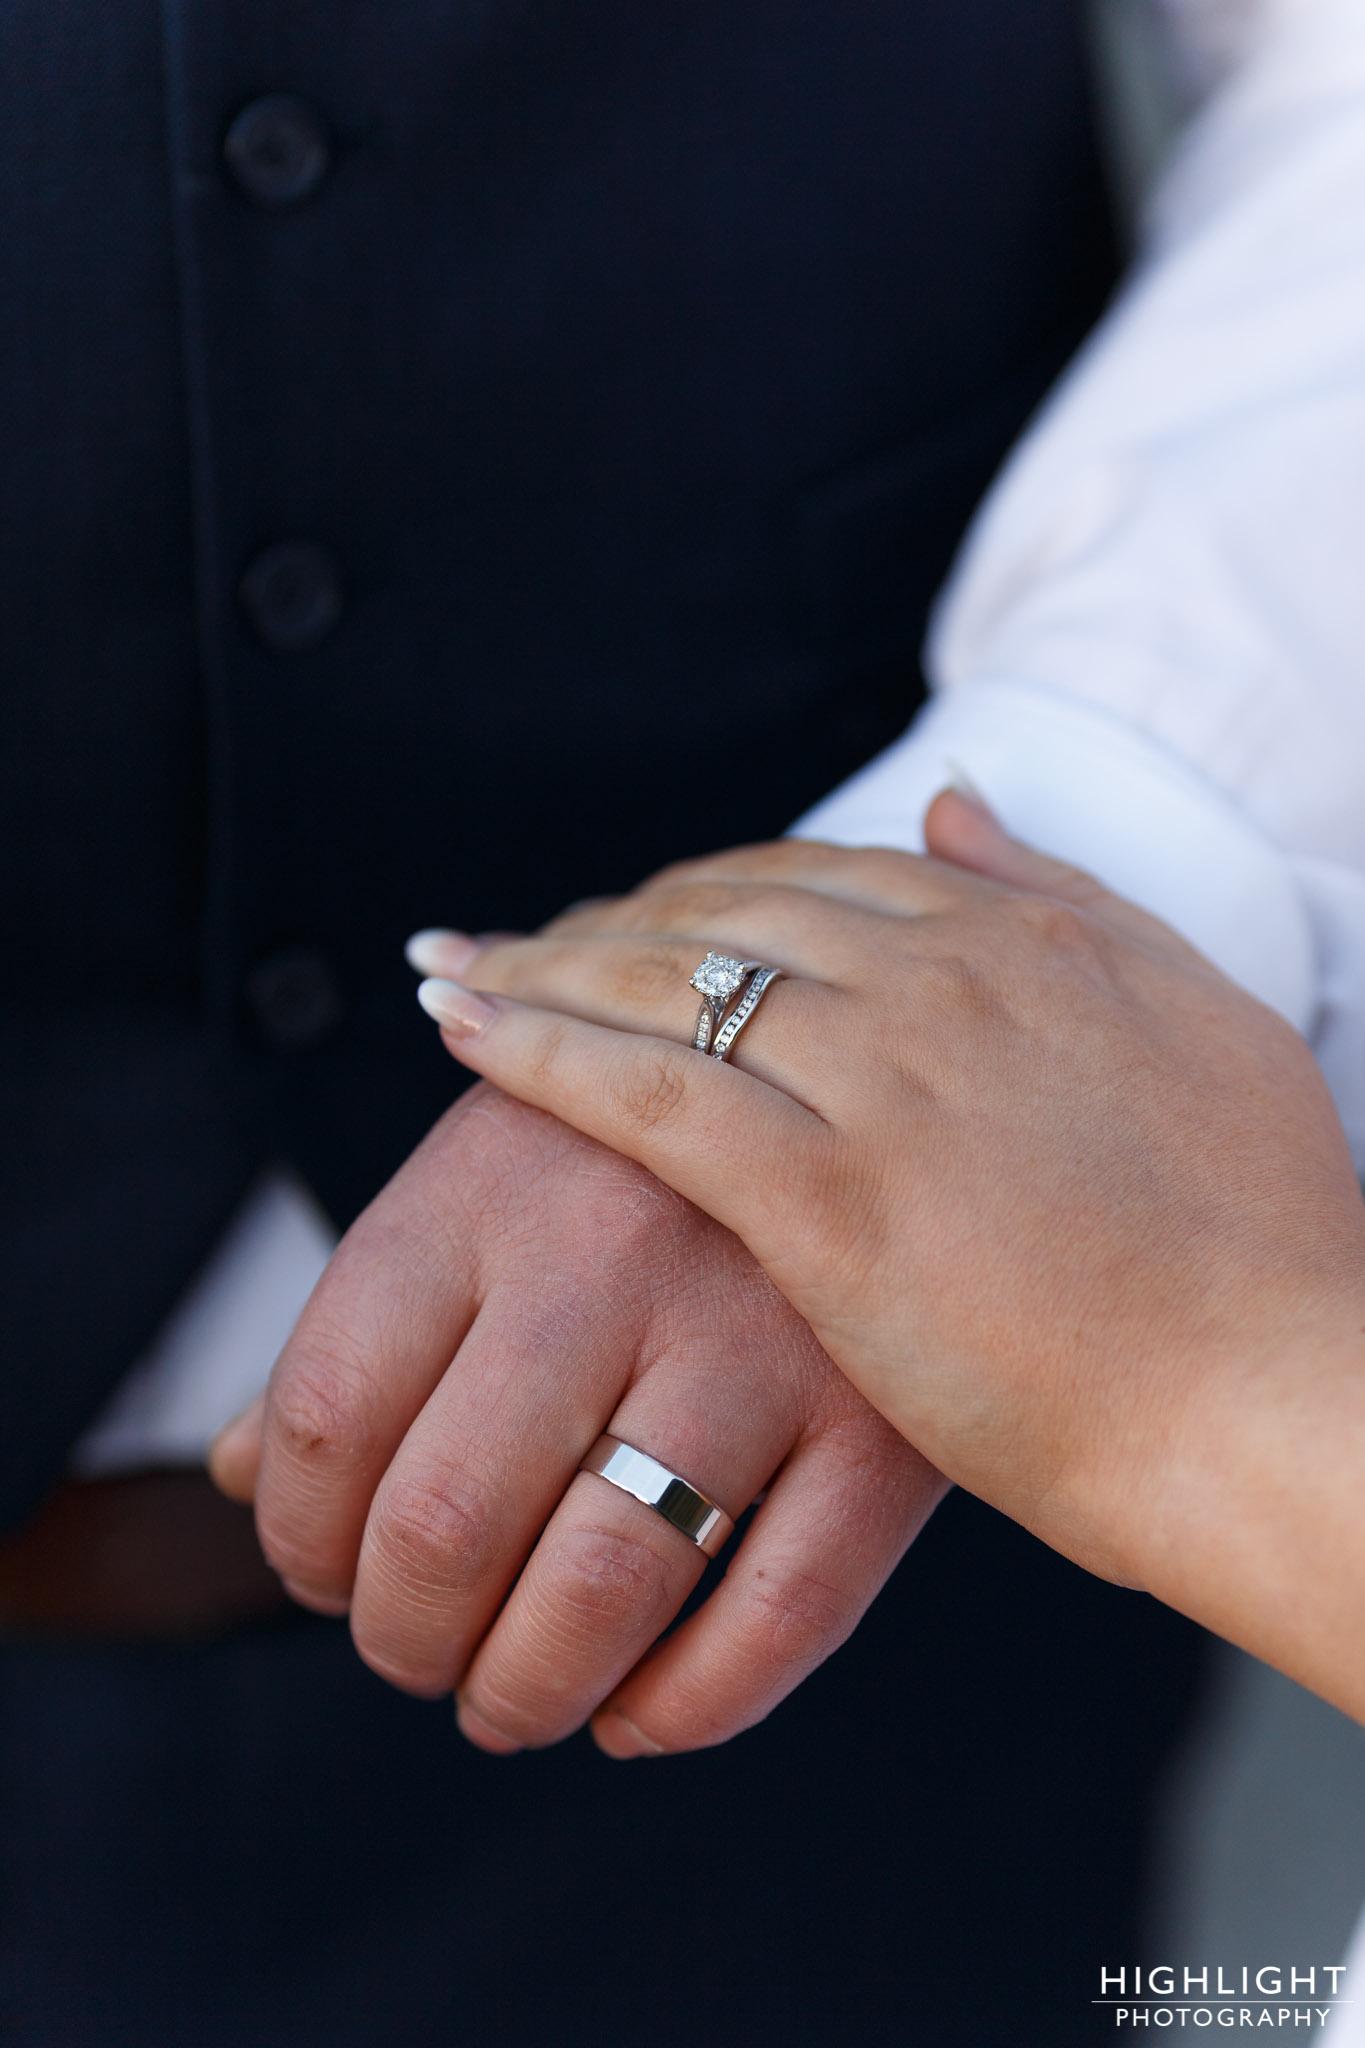 Highlight-wedding-photography-new-zealand-palmerston-north-94.jpg